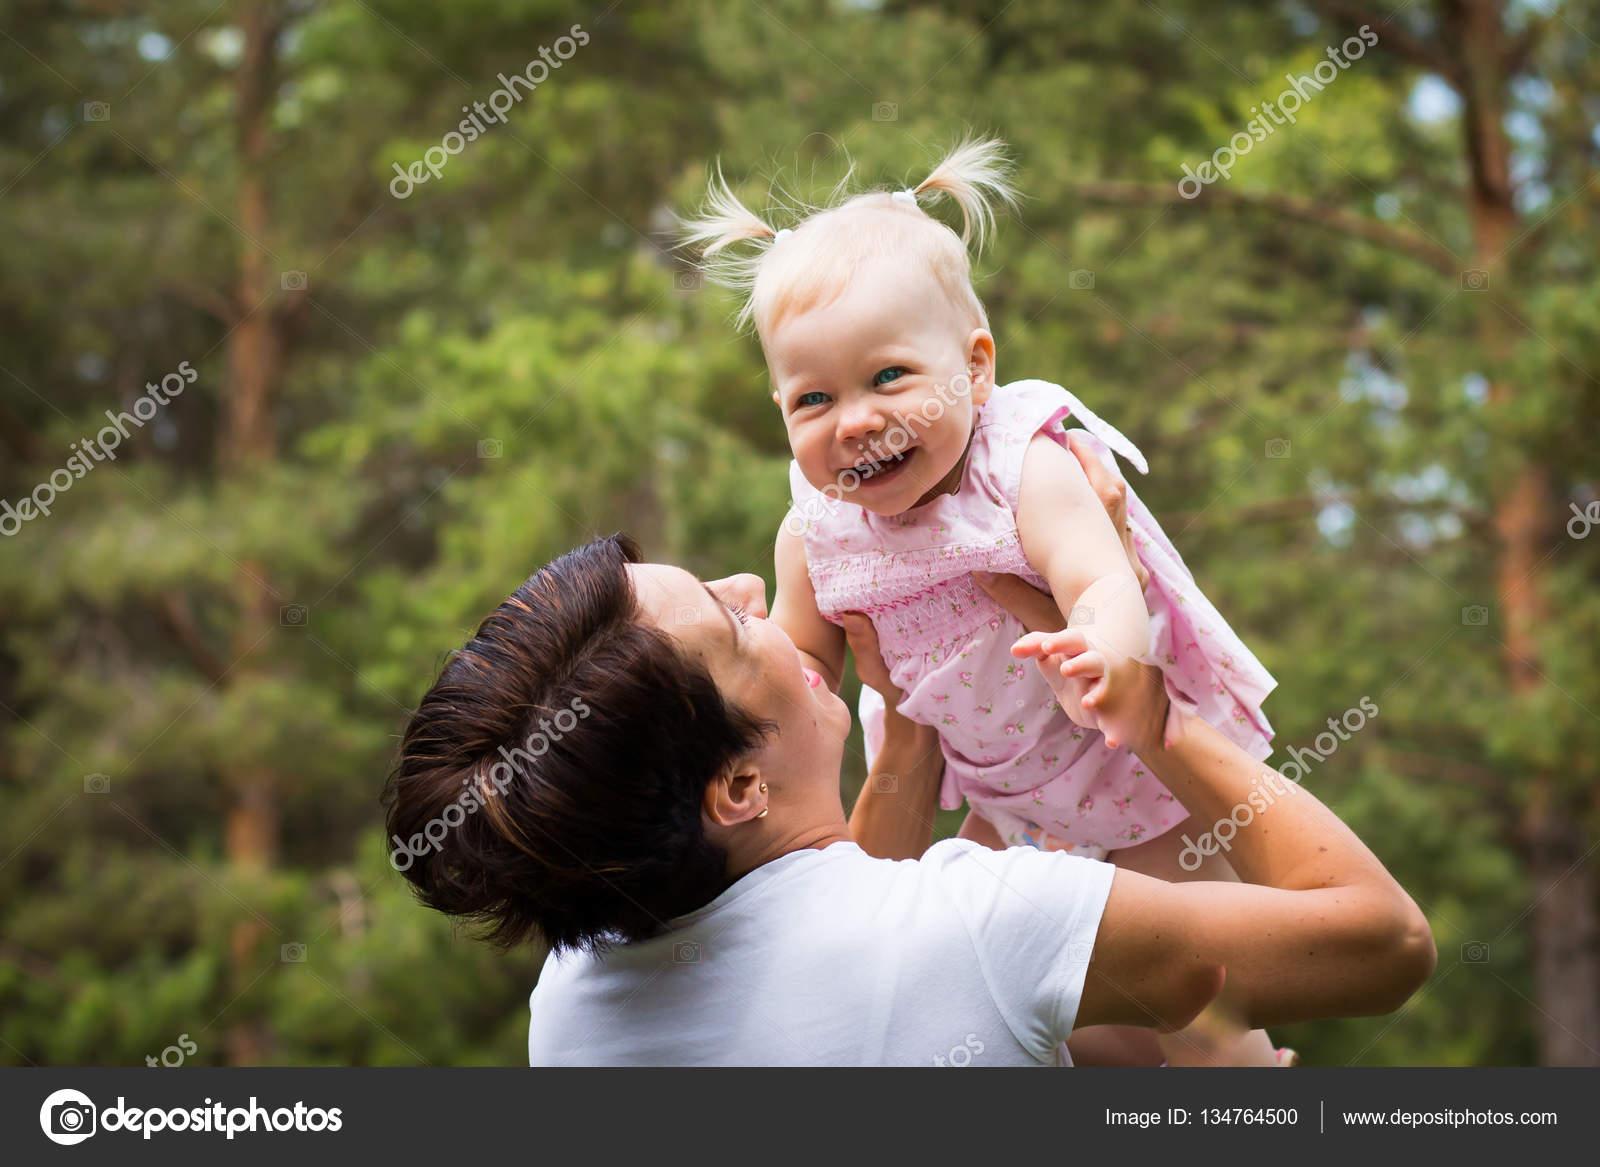 Nice cute babies Hd Wallpapers Small Cute Baby And Nice Mom Outdoors Stock Photo Depositphotos Small Cute Baby And Nice Mom Outdoors Stock Photo Keleny 134764500